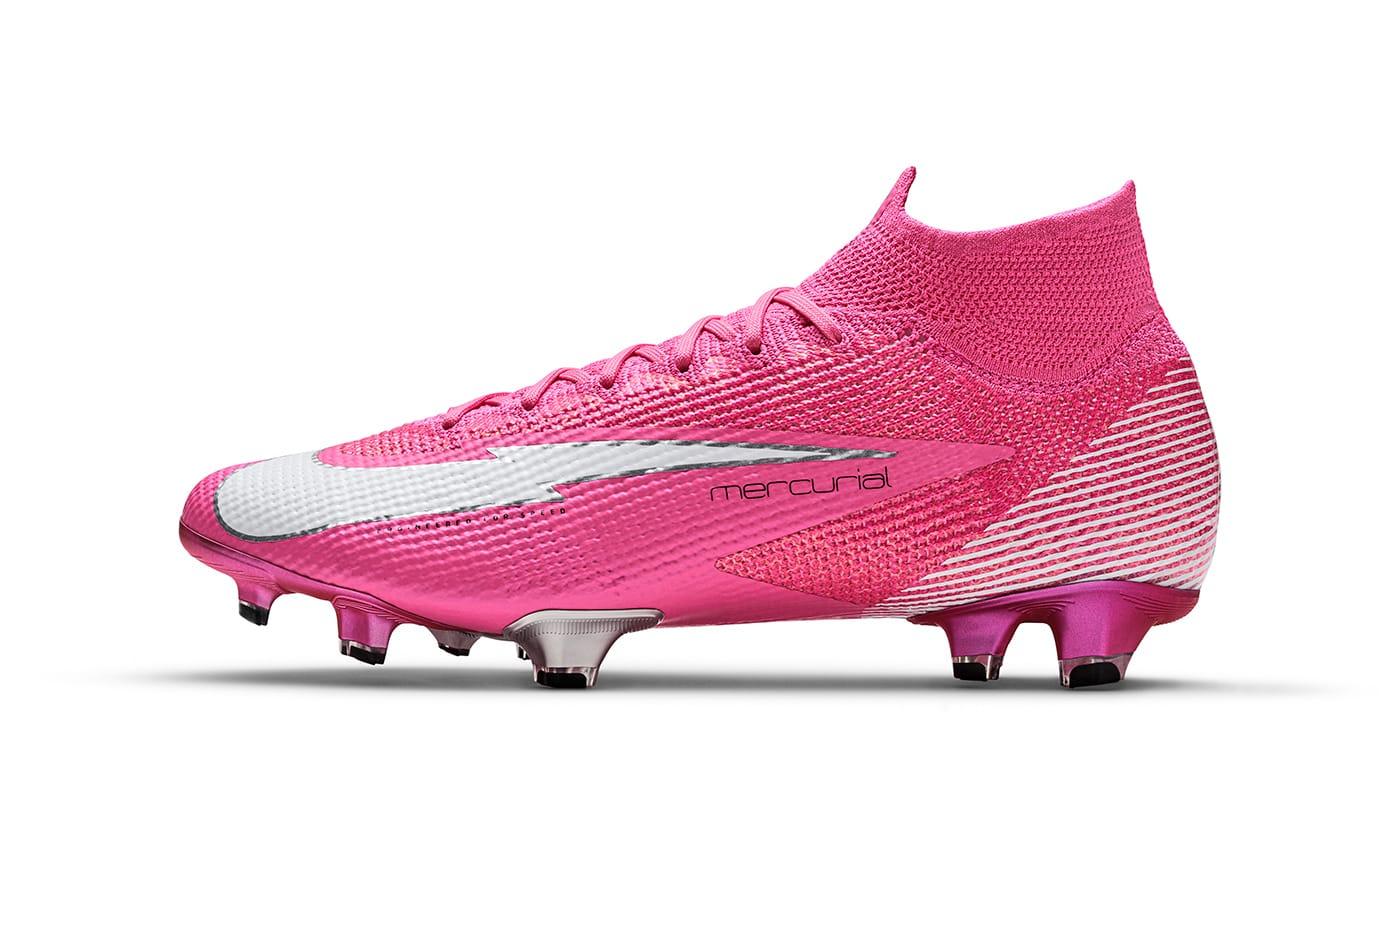 Kylian Mbappe Nike Mercurial Superfly